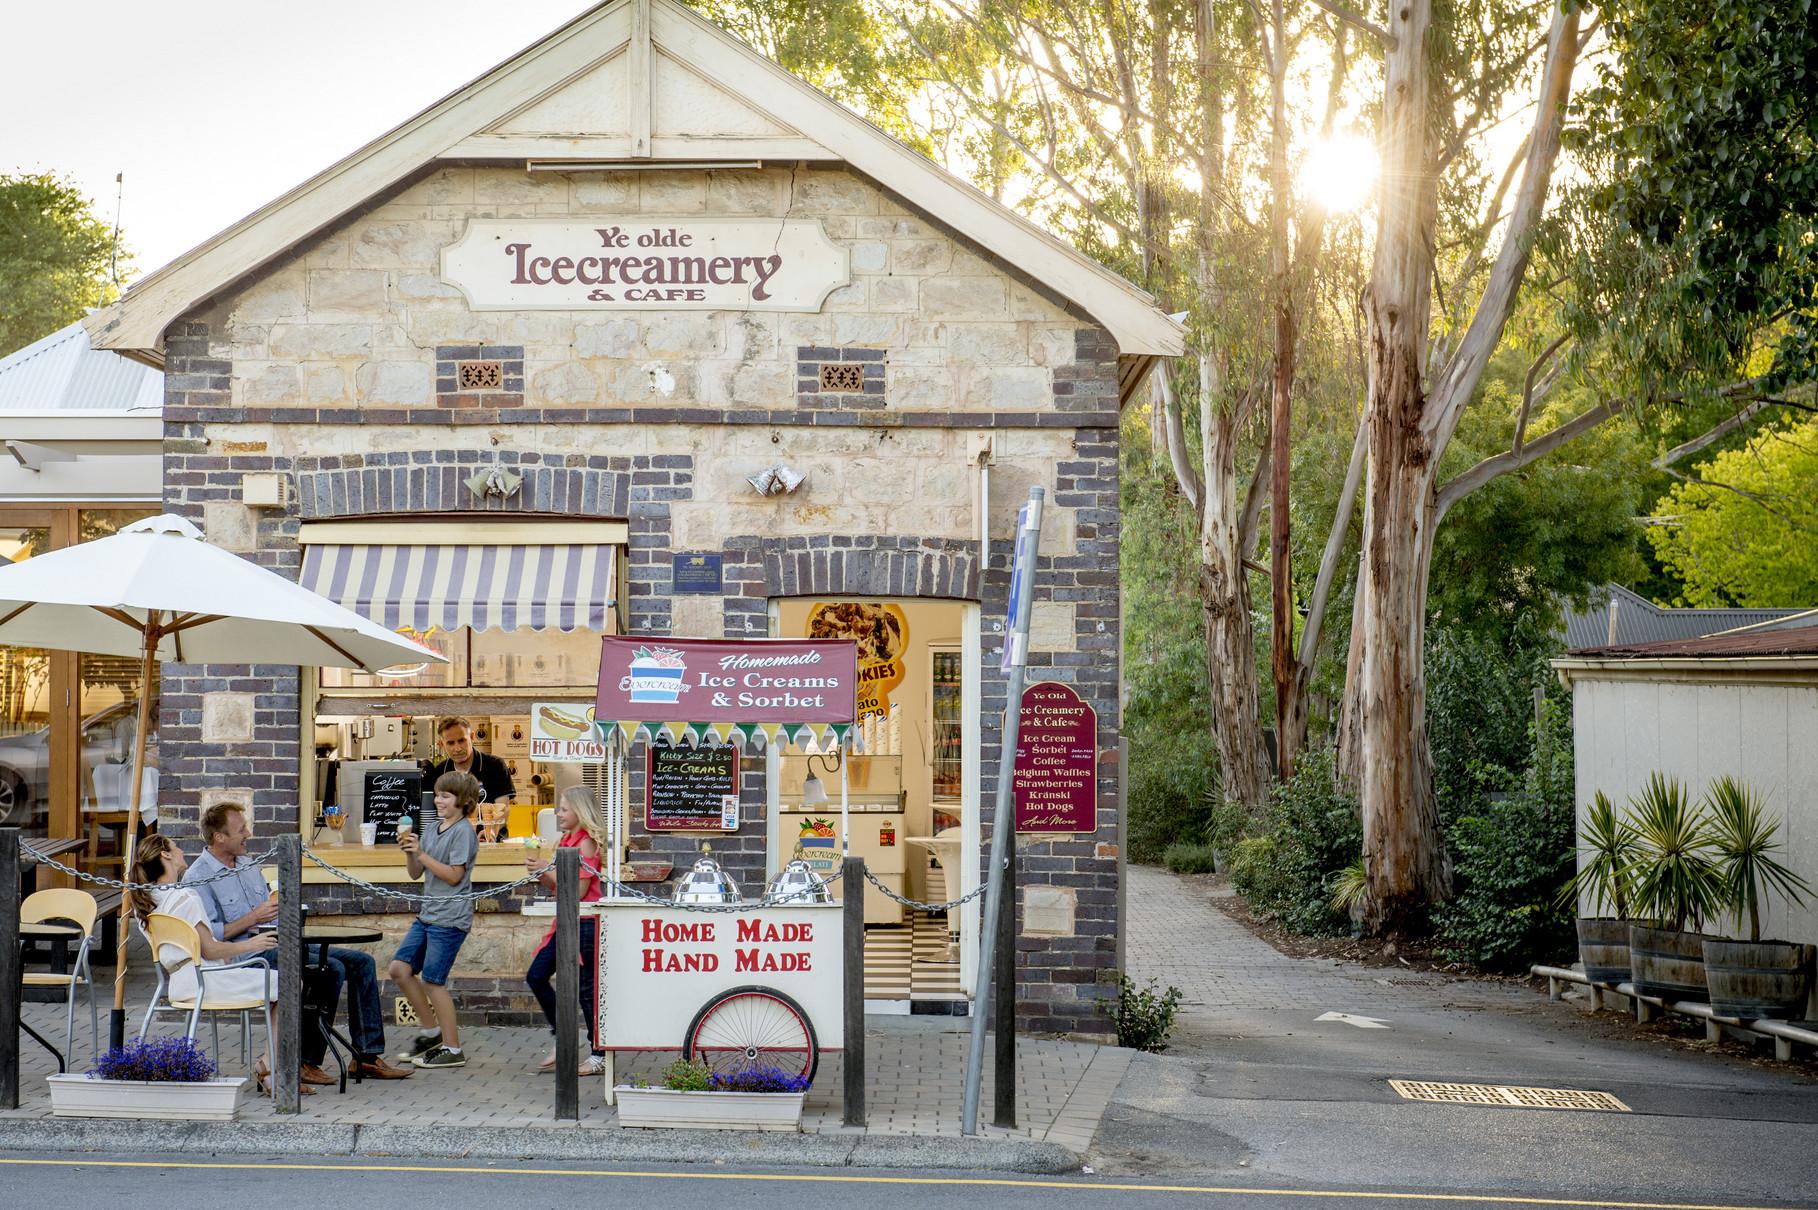 Hahndorf Main Street, Adelaide Hills